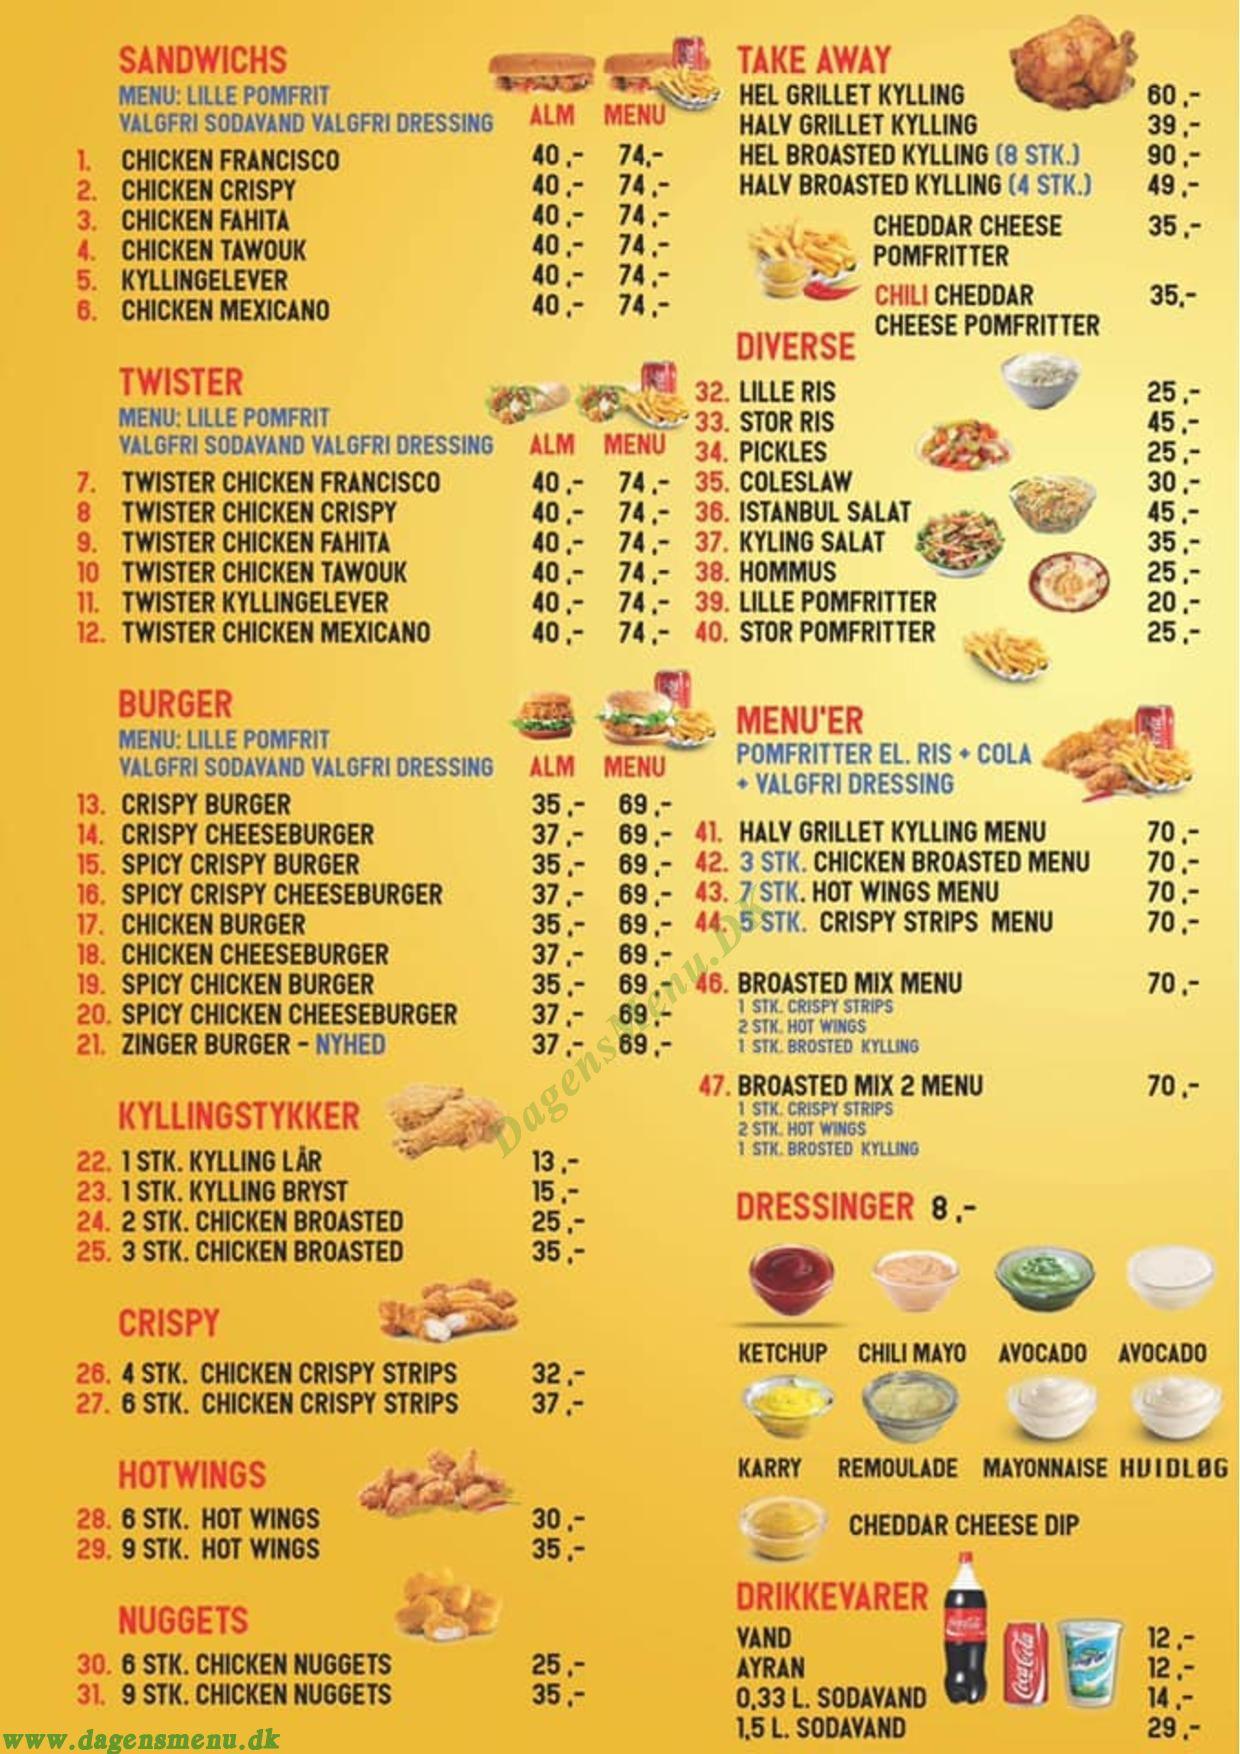 IFC Istanbul Chicken - Menukort